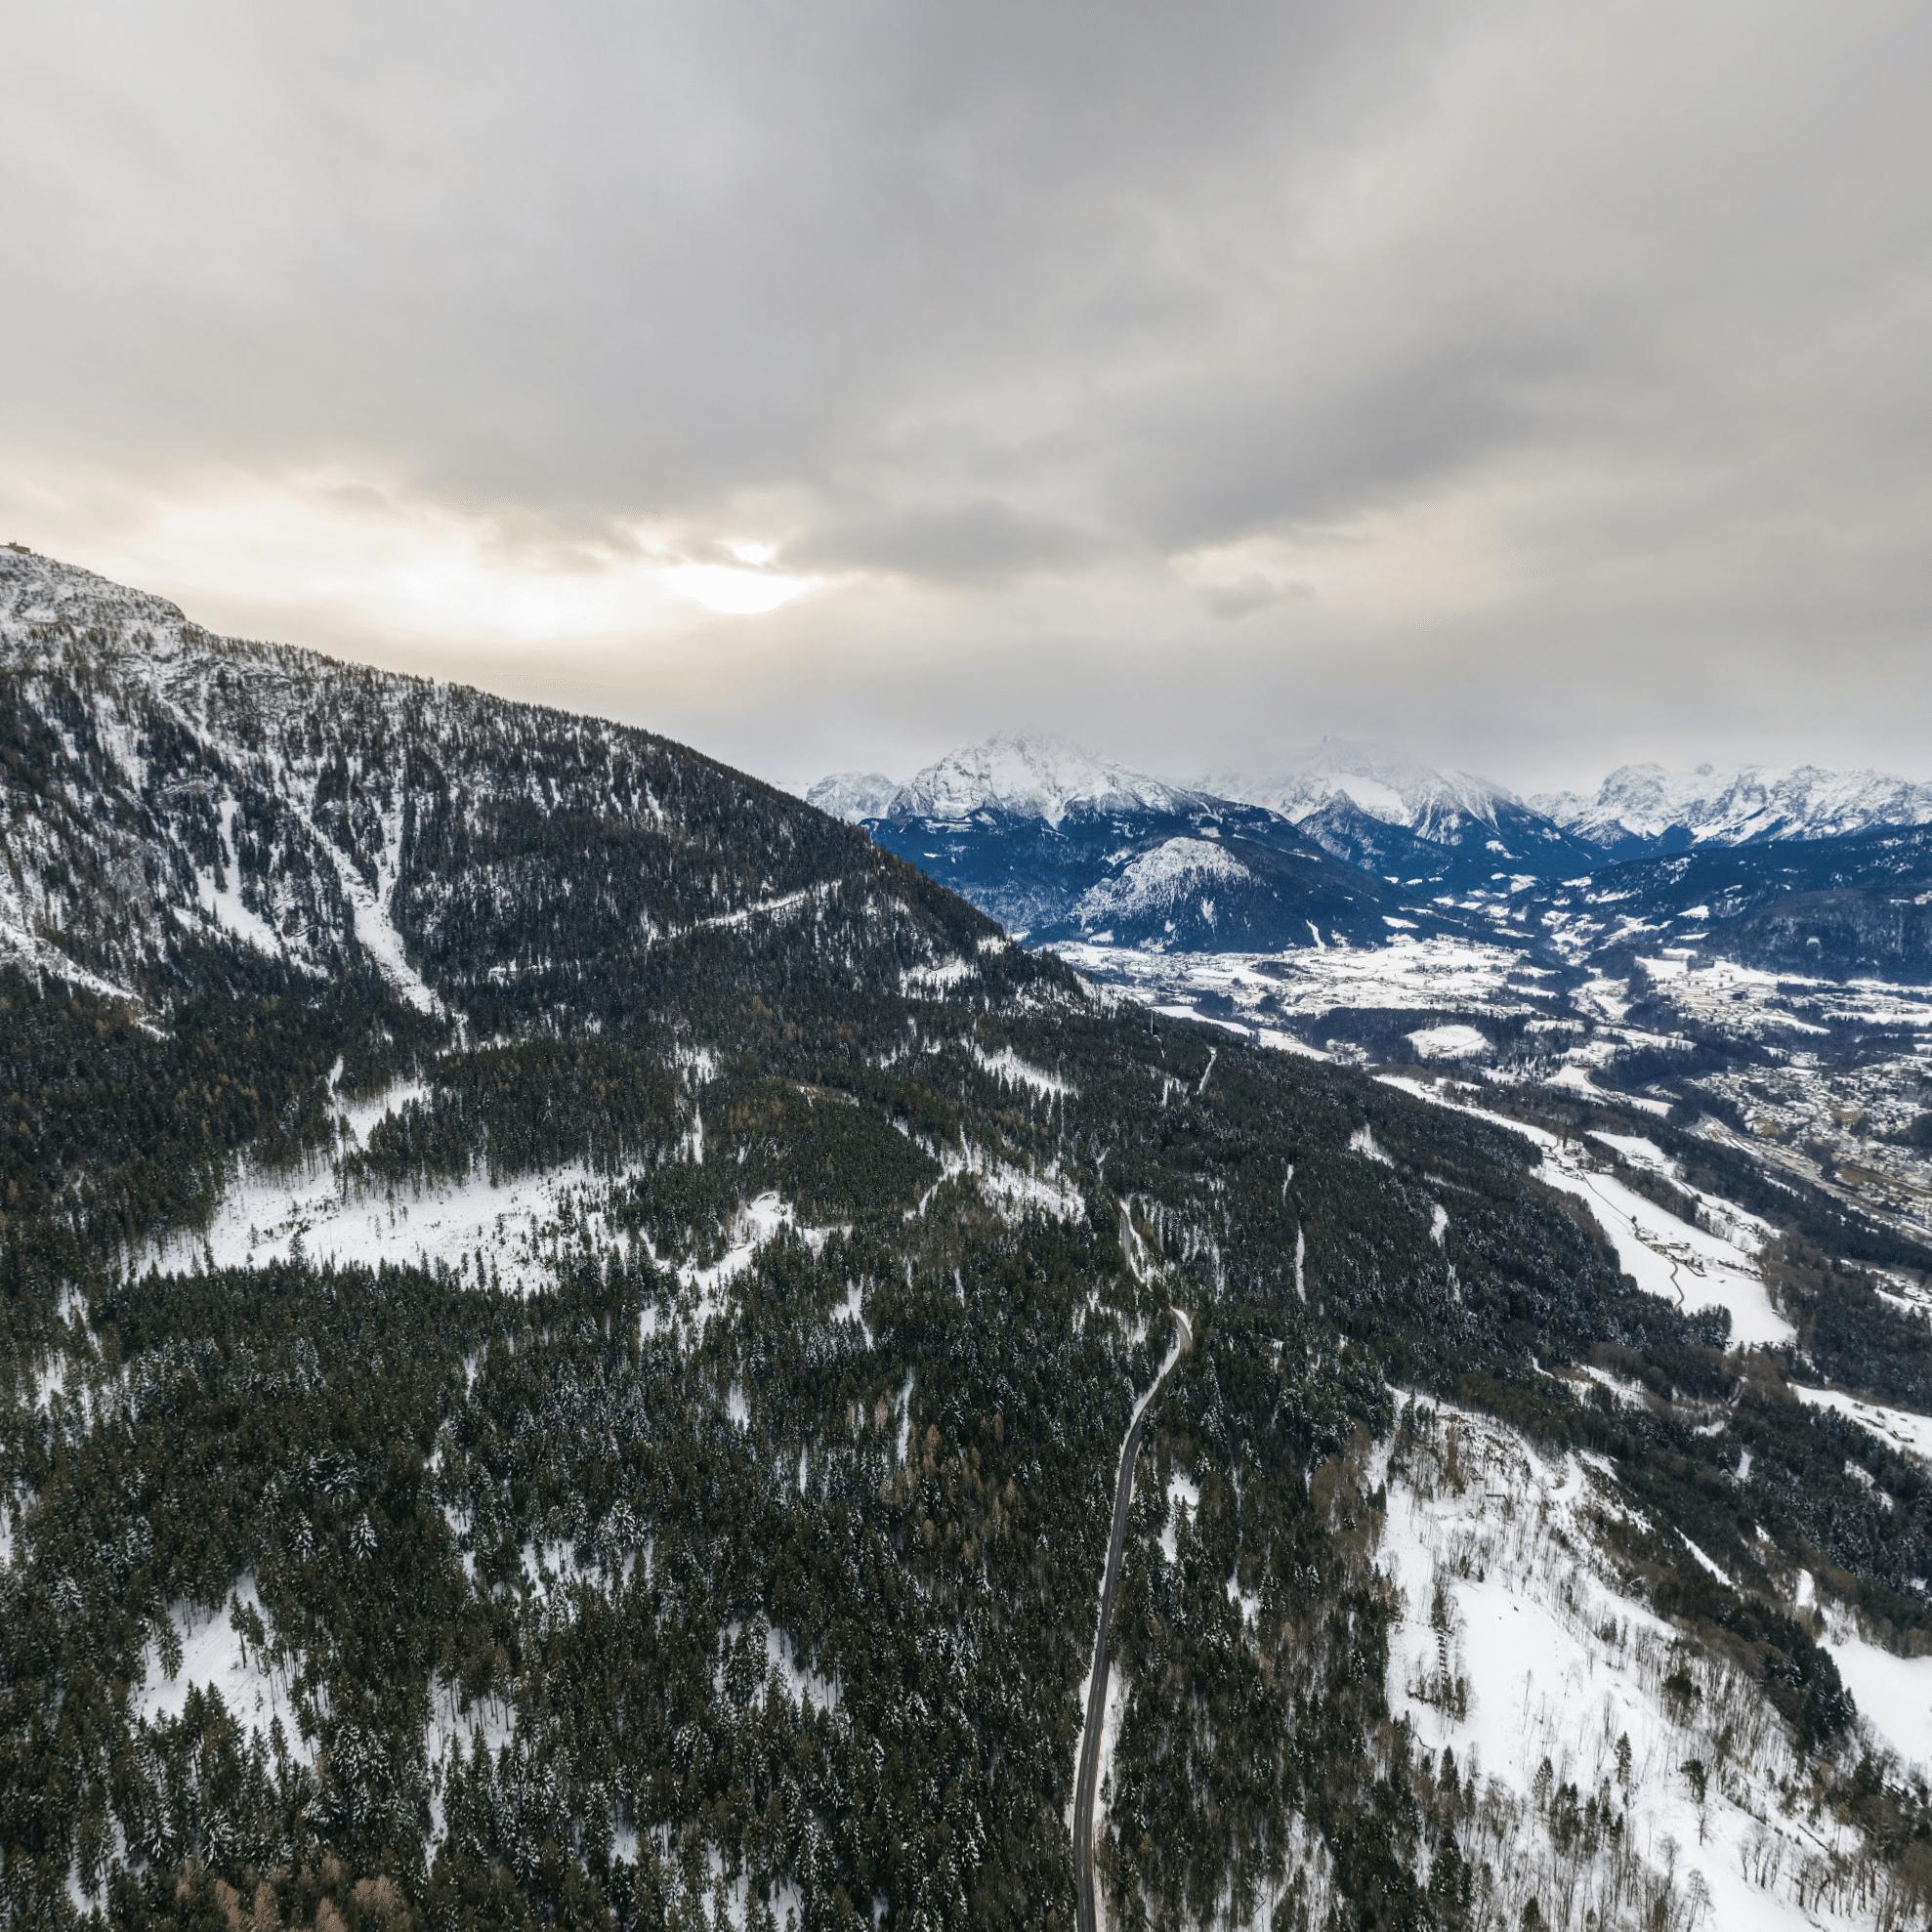 berchtesgaden deutschland patrick roddelkopf patrick roddelkopf fotografie